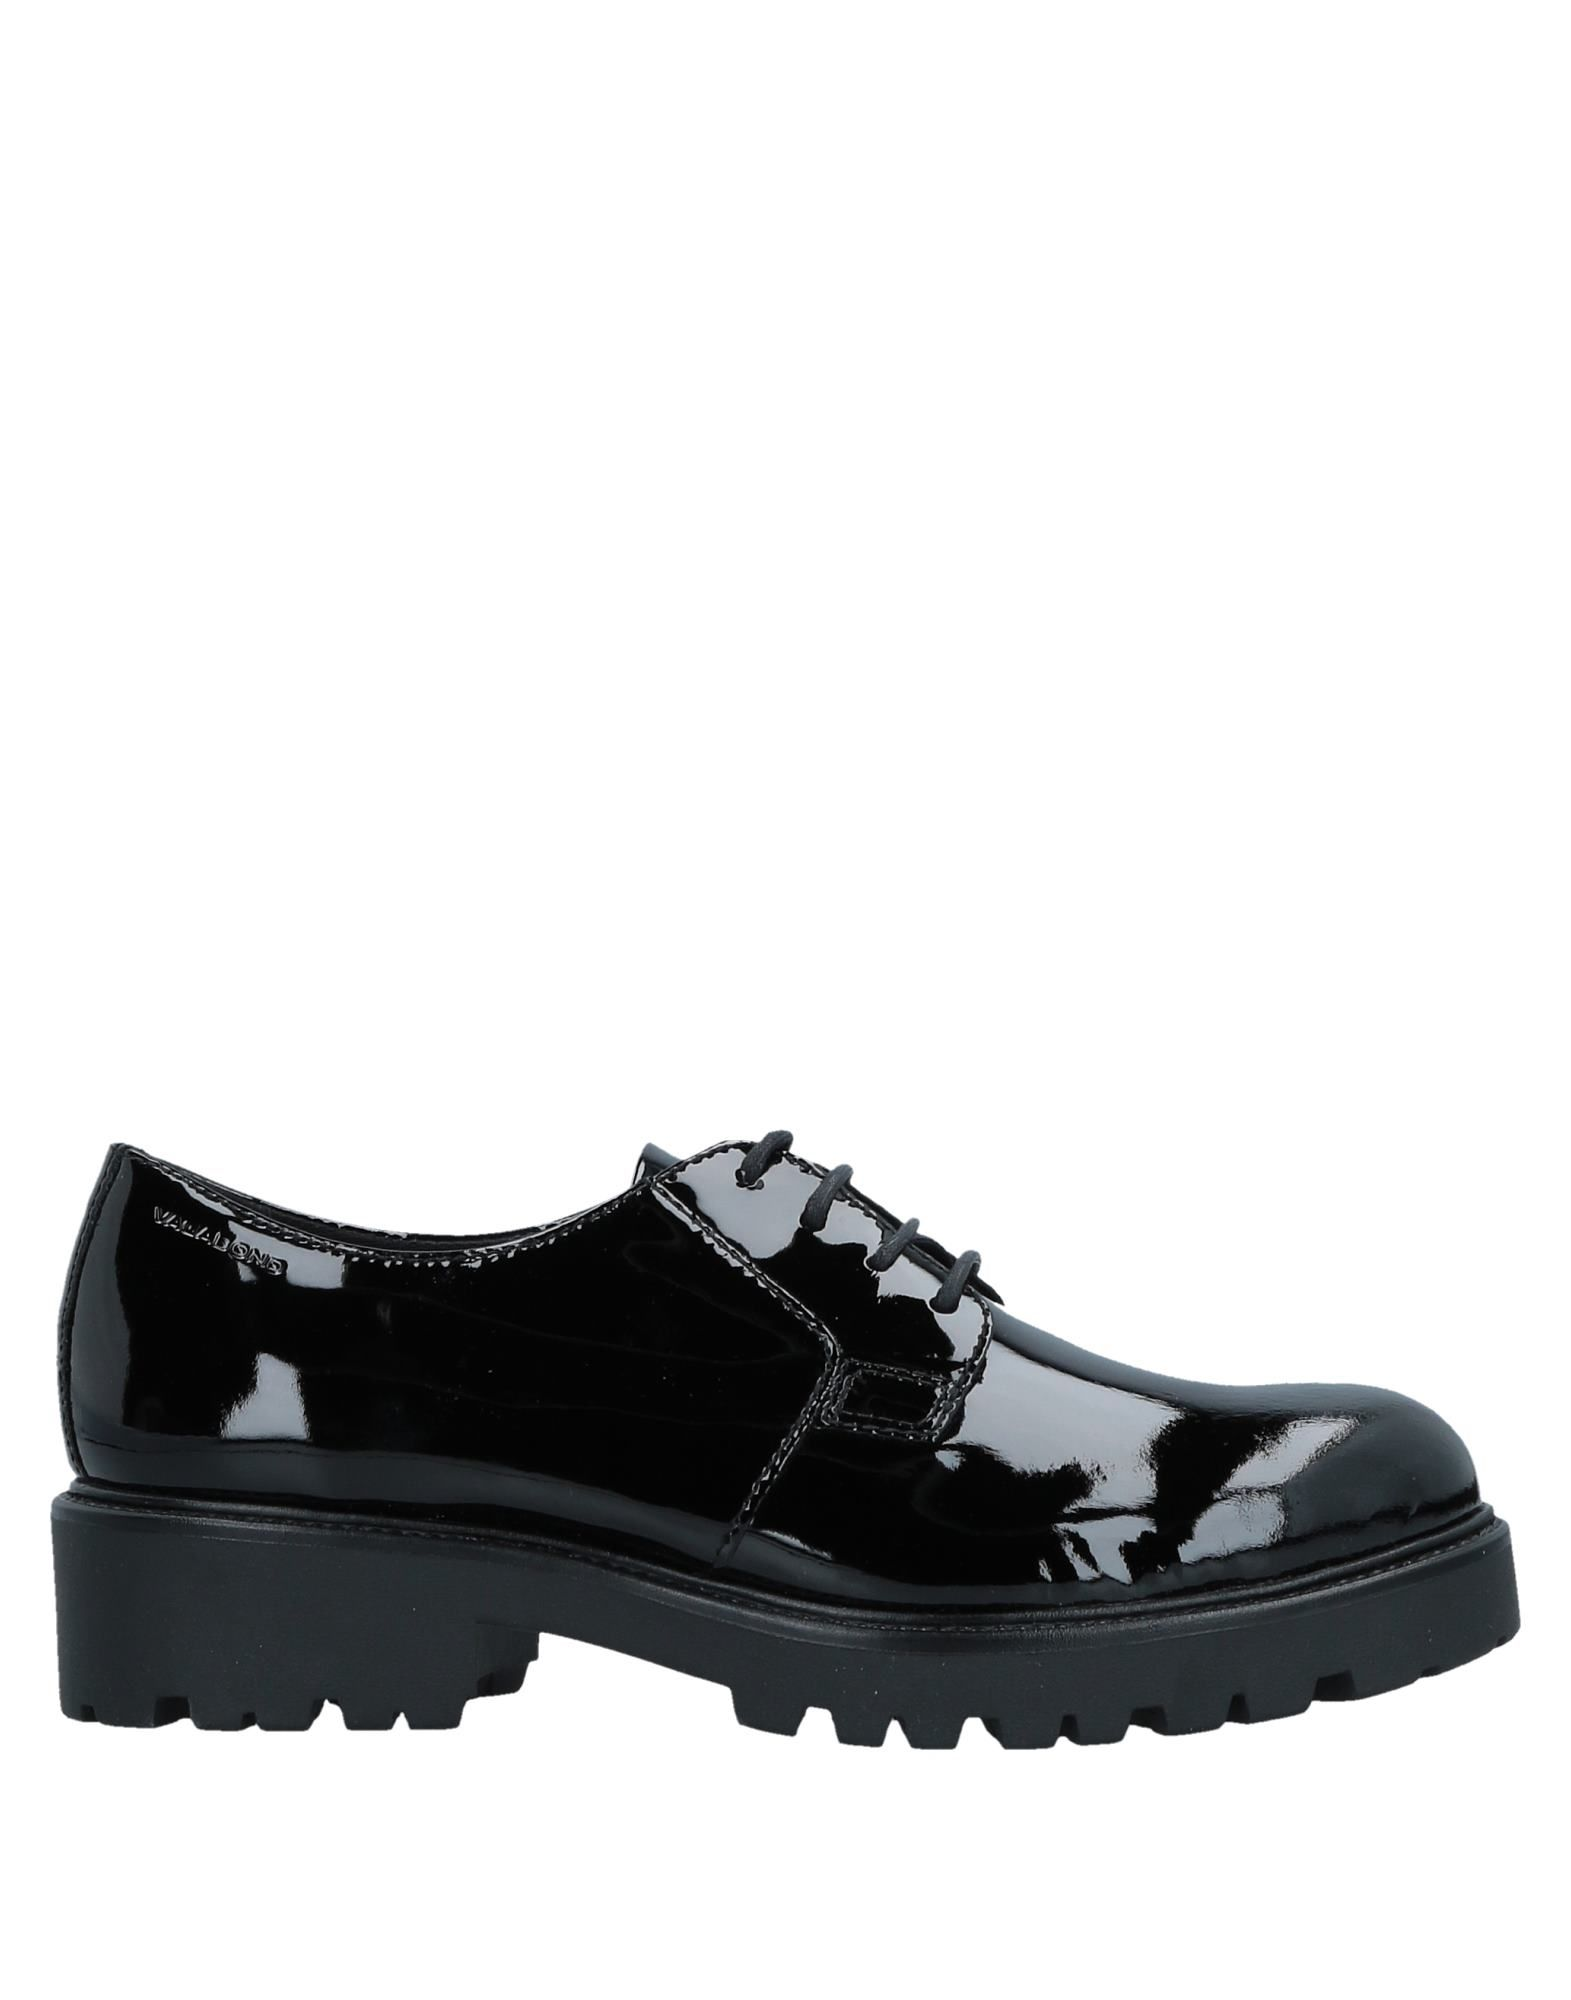 Stringate Vagabond Shoemakers Donna - 11522772PU